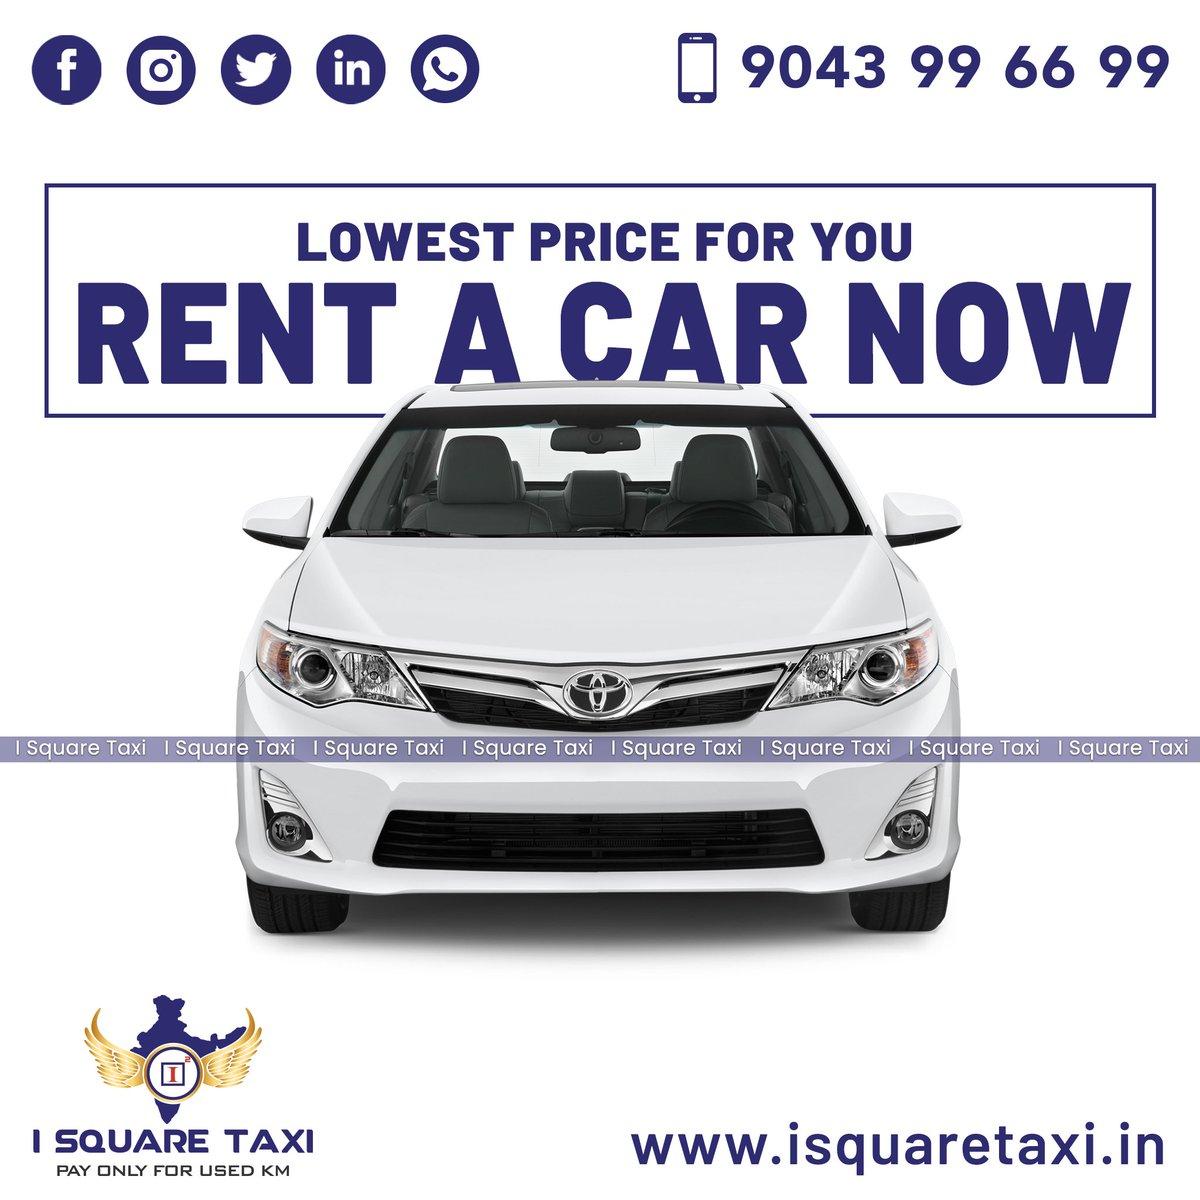 Lowest Price, Rent a Car Now.. Call: 9043 99 66 99 Book online:  #isquaretaxi #lowestprice #comfortjourneys #ourpassion #salem #krishnagiri #erode #coimbatore #namakkal #incredibleindia